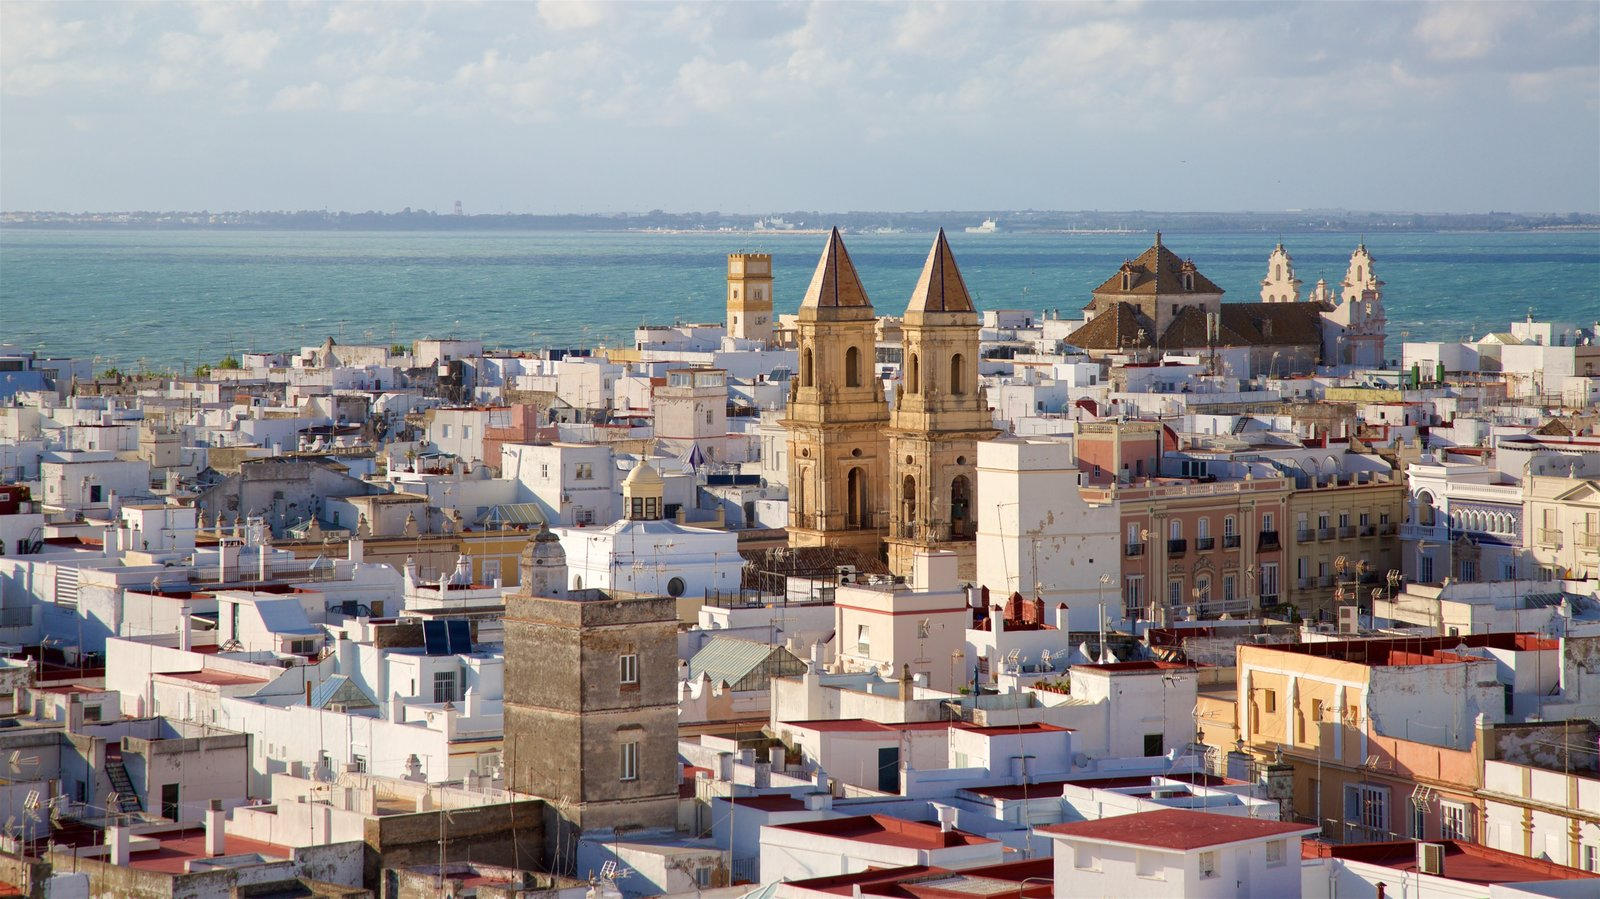 Tavira Португалия фото города